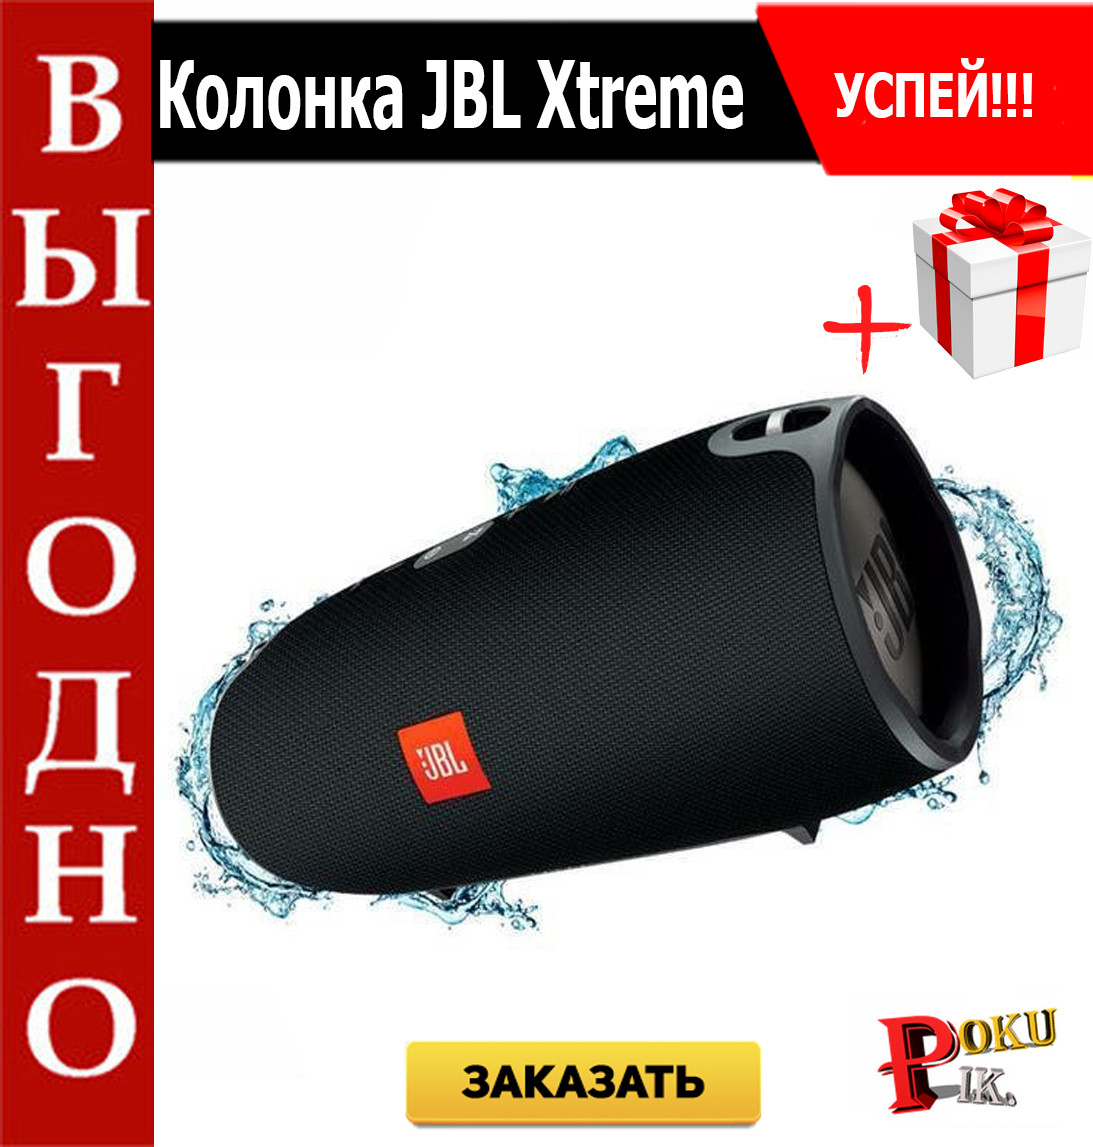 Колонка портативная в стиле JBL Xtreme